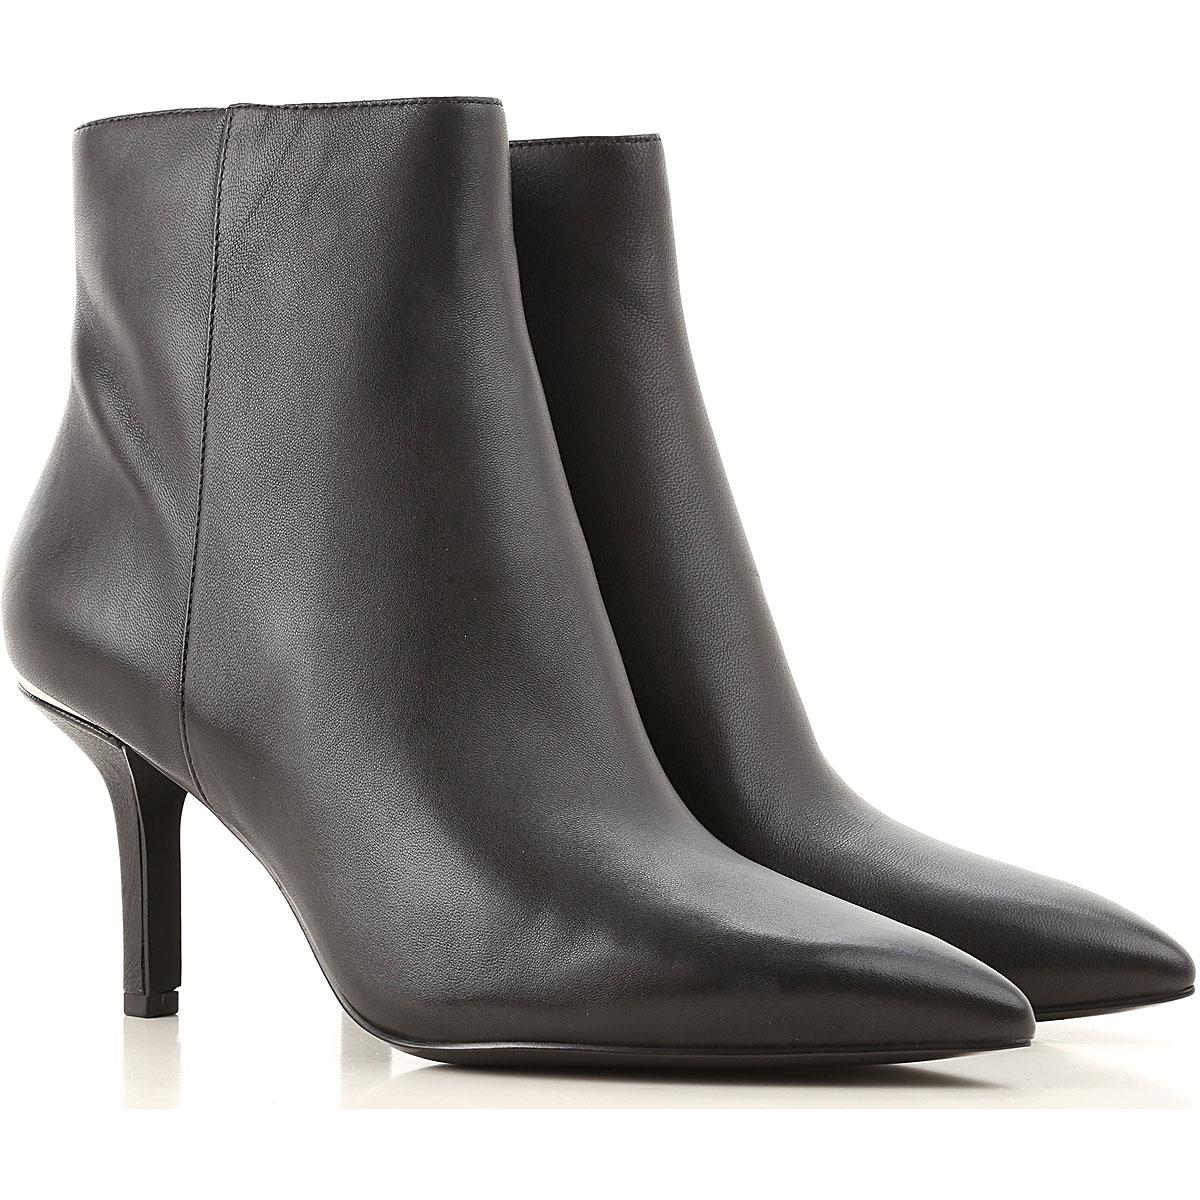 Michael Kors Boots For Women, Booties, Black, Leather, 2021, Us 9 (Eu 40) Us 8 (Eu 38.5)